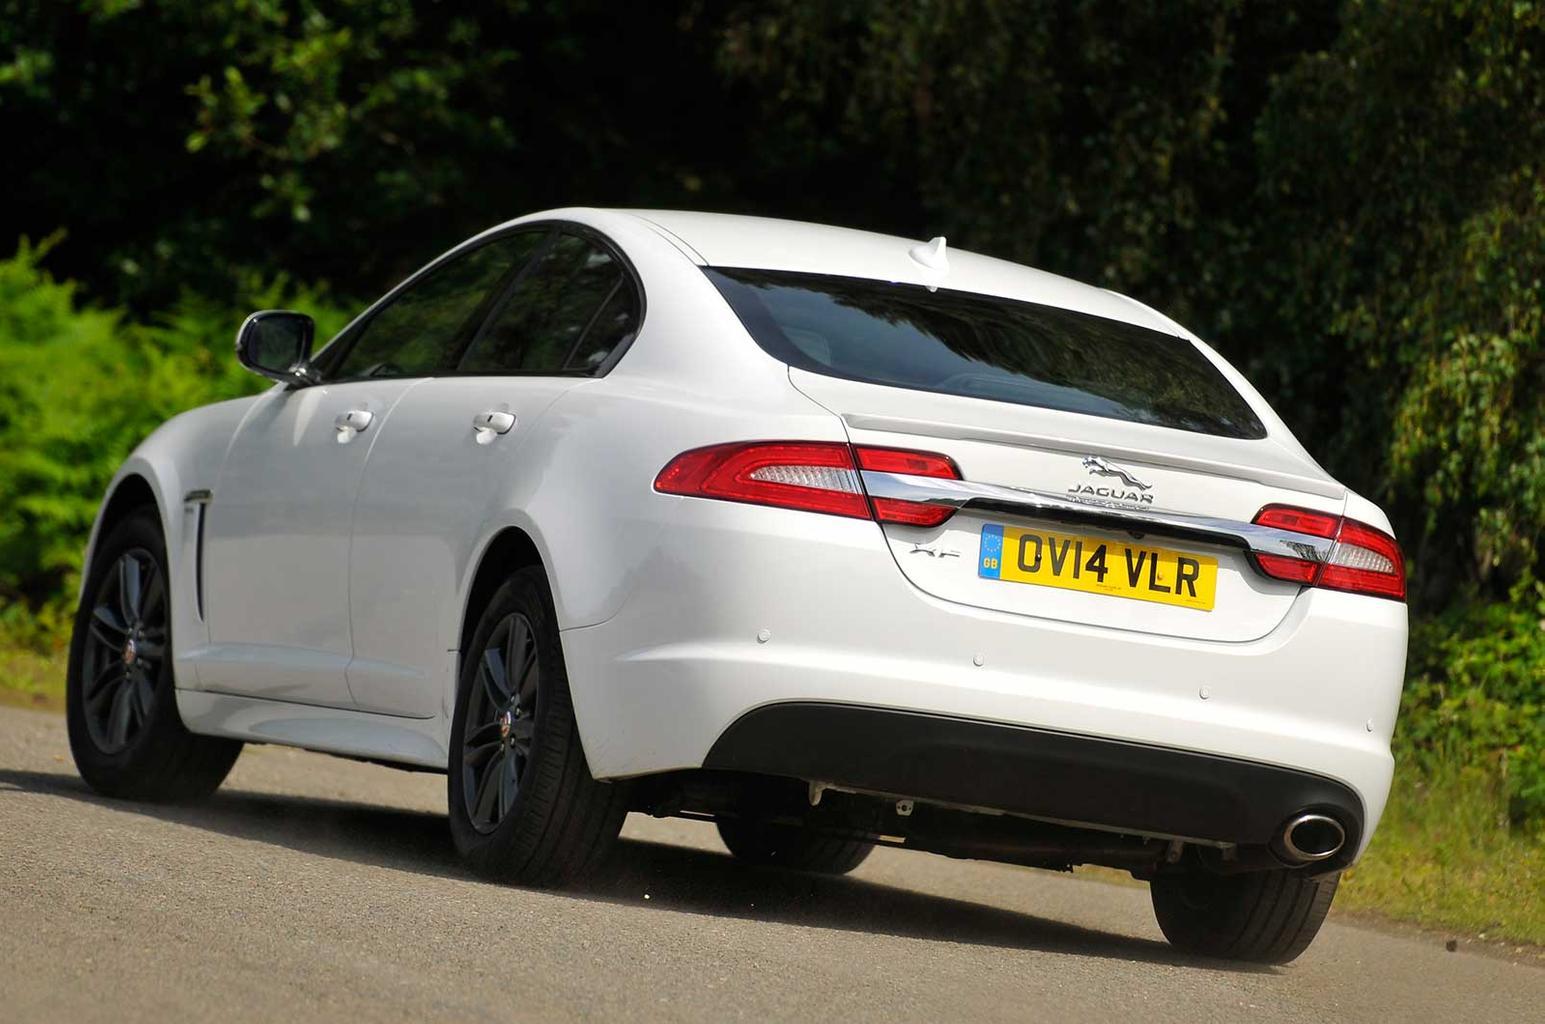 Used car of the week: Jaguar XF